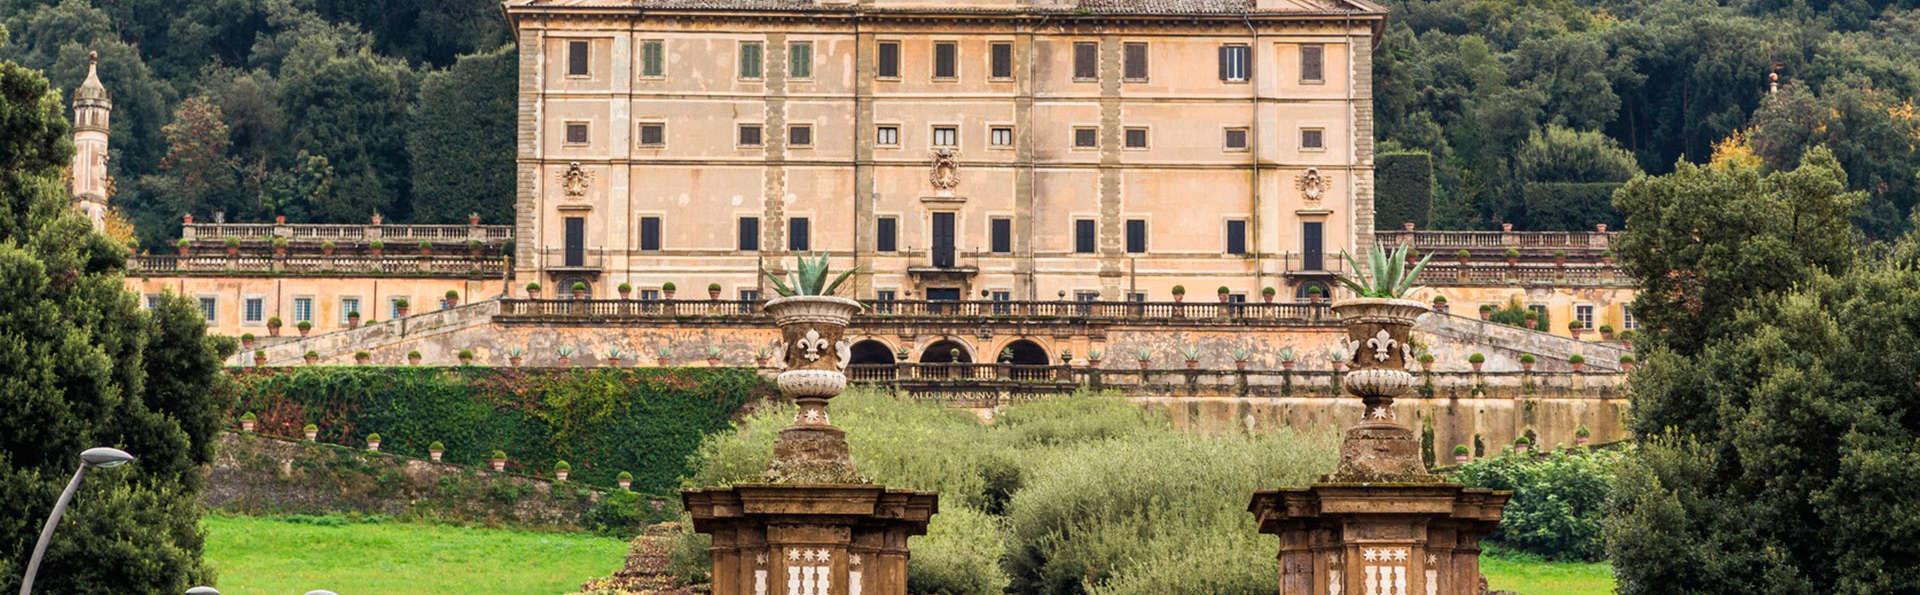 Hotel Flora - edit_castelli-romani.jpg